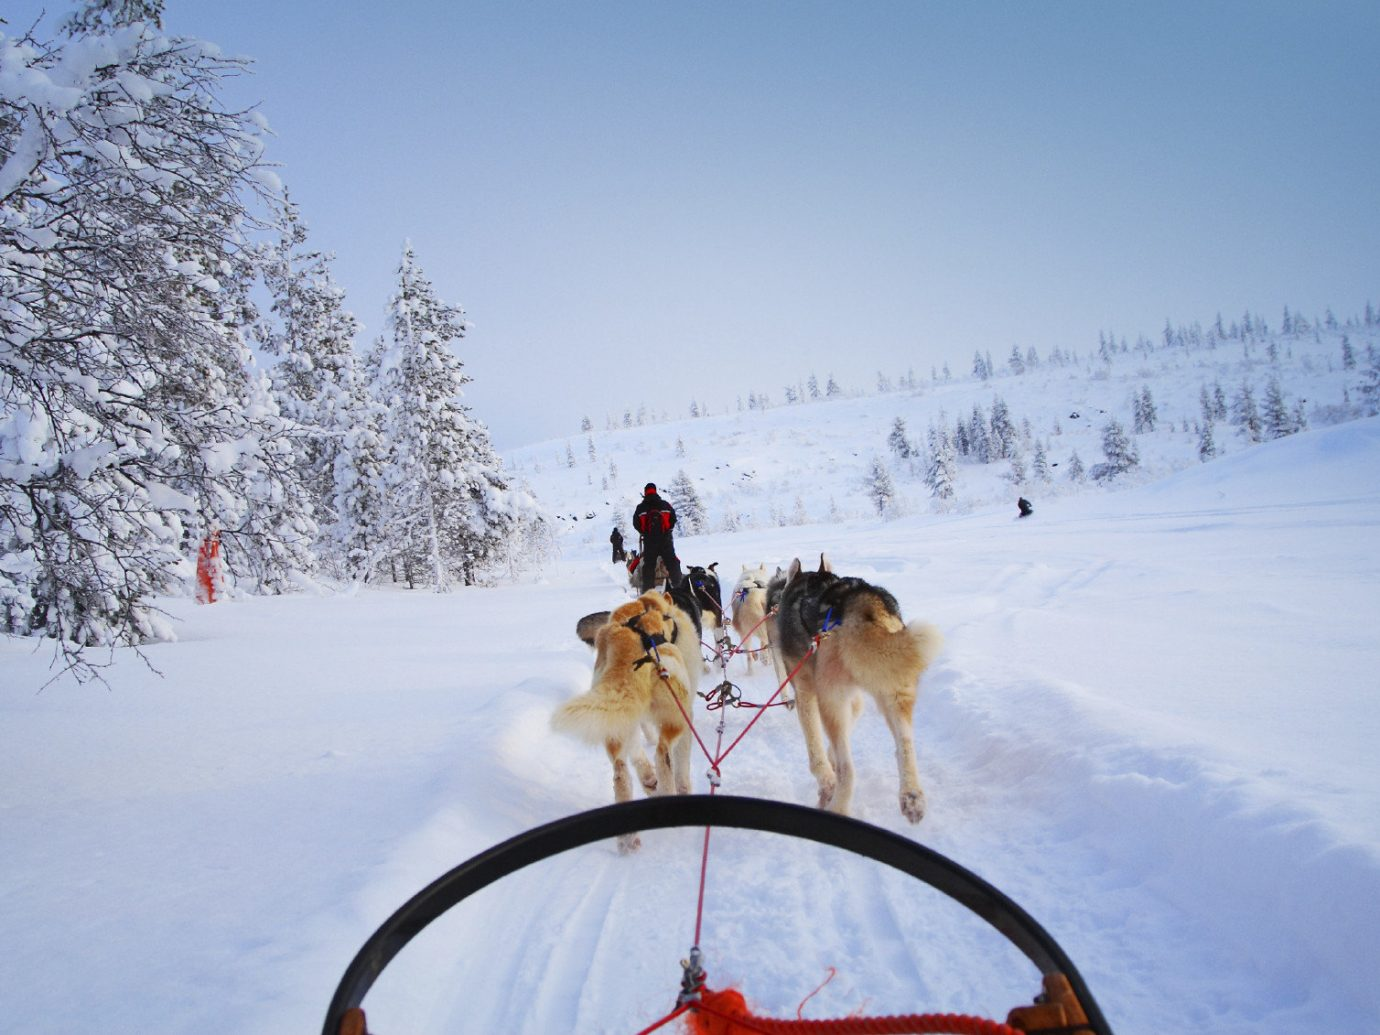 Adventure Trip Ideas snow outdoor sky transport dog sled vehicle land vehicle mushing Winter season sled dog racing sled